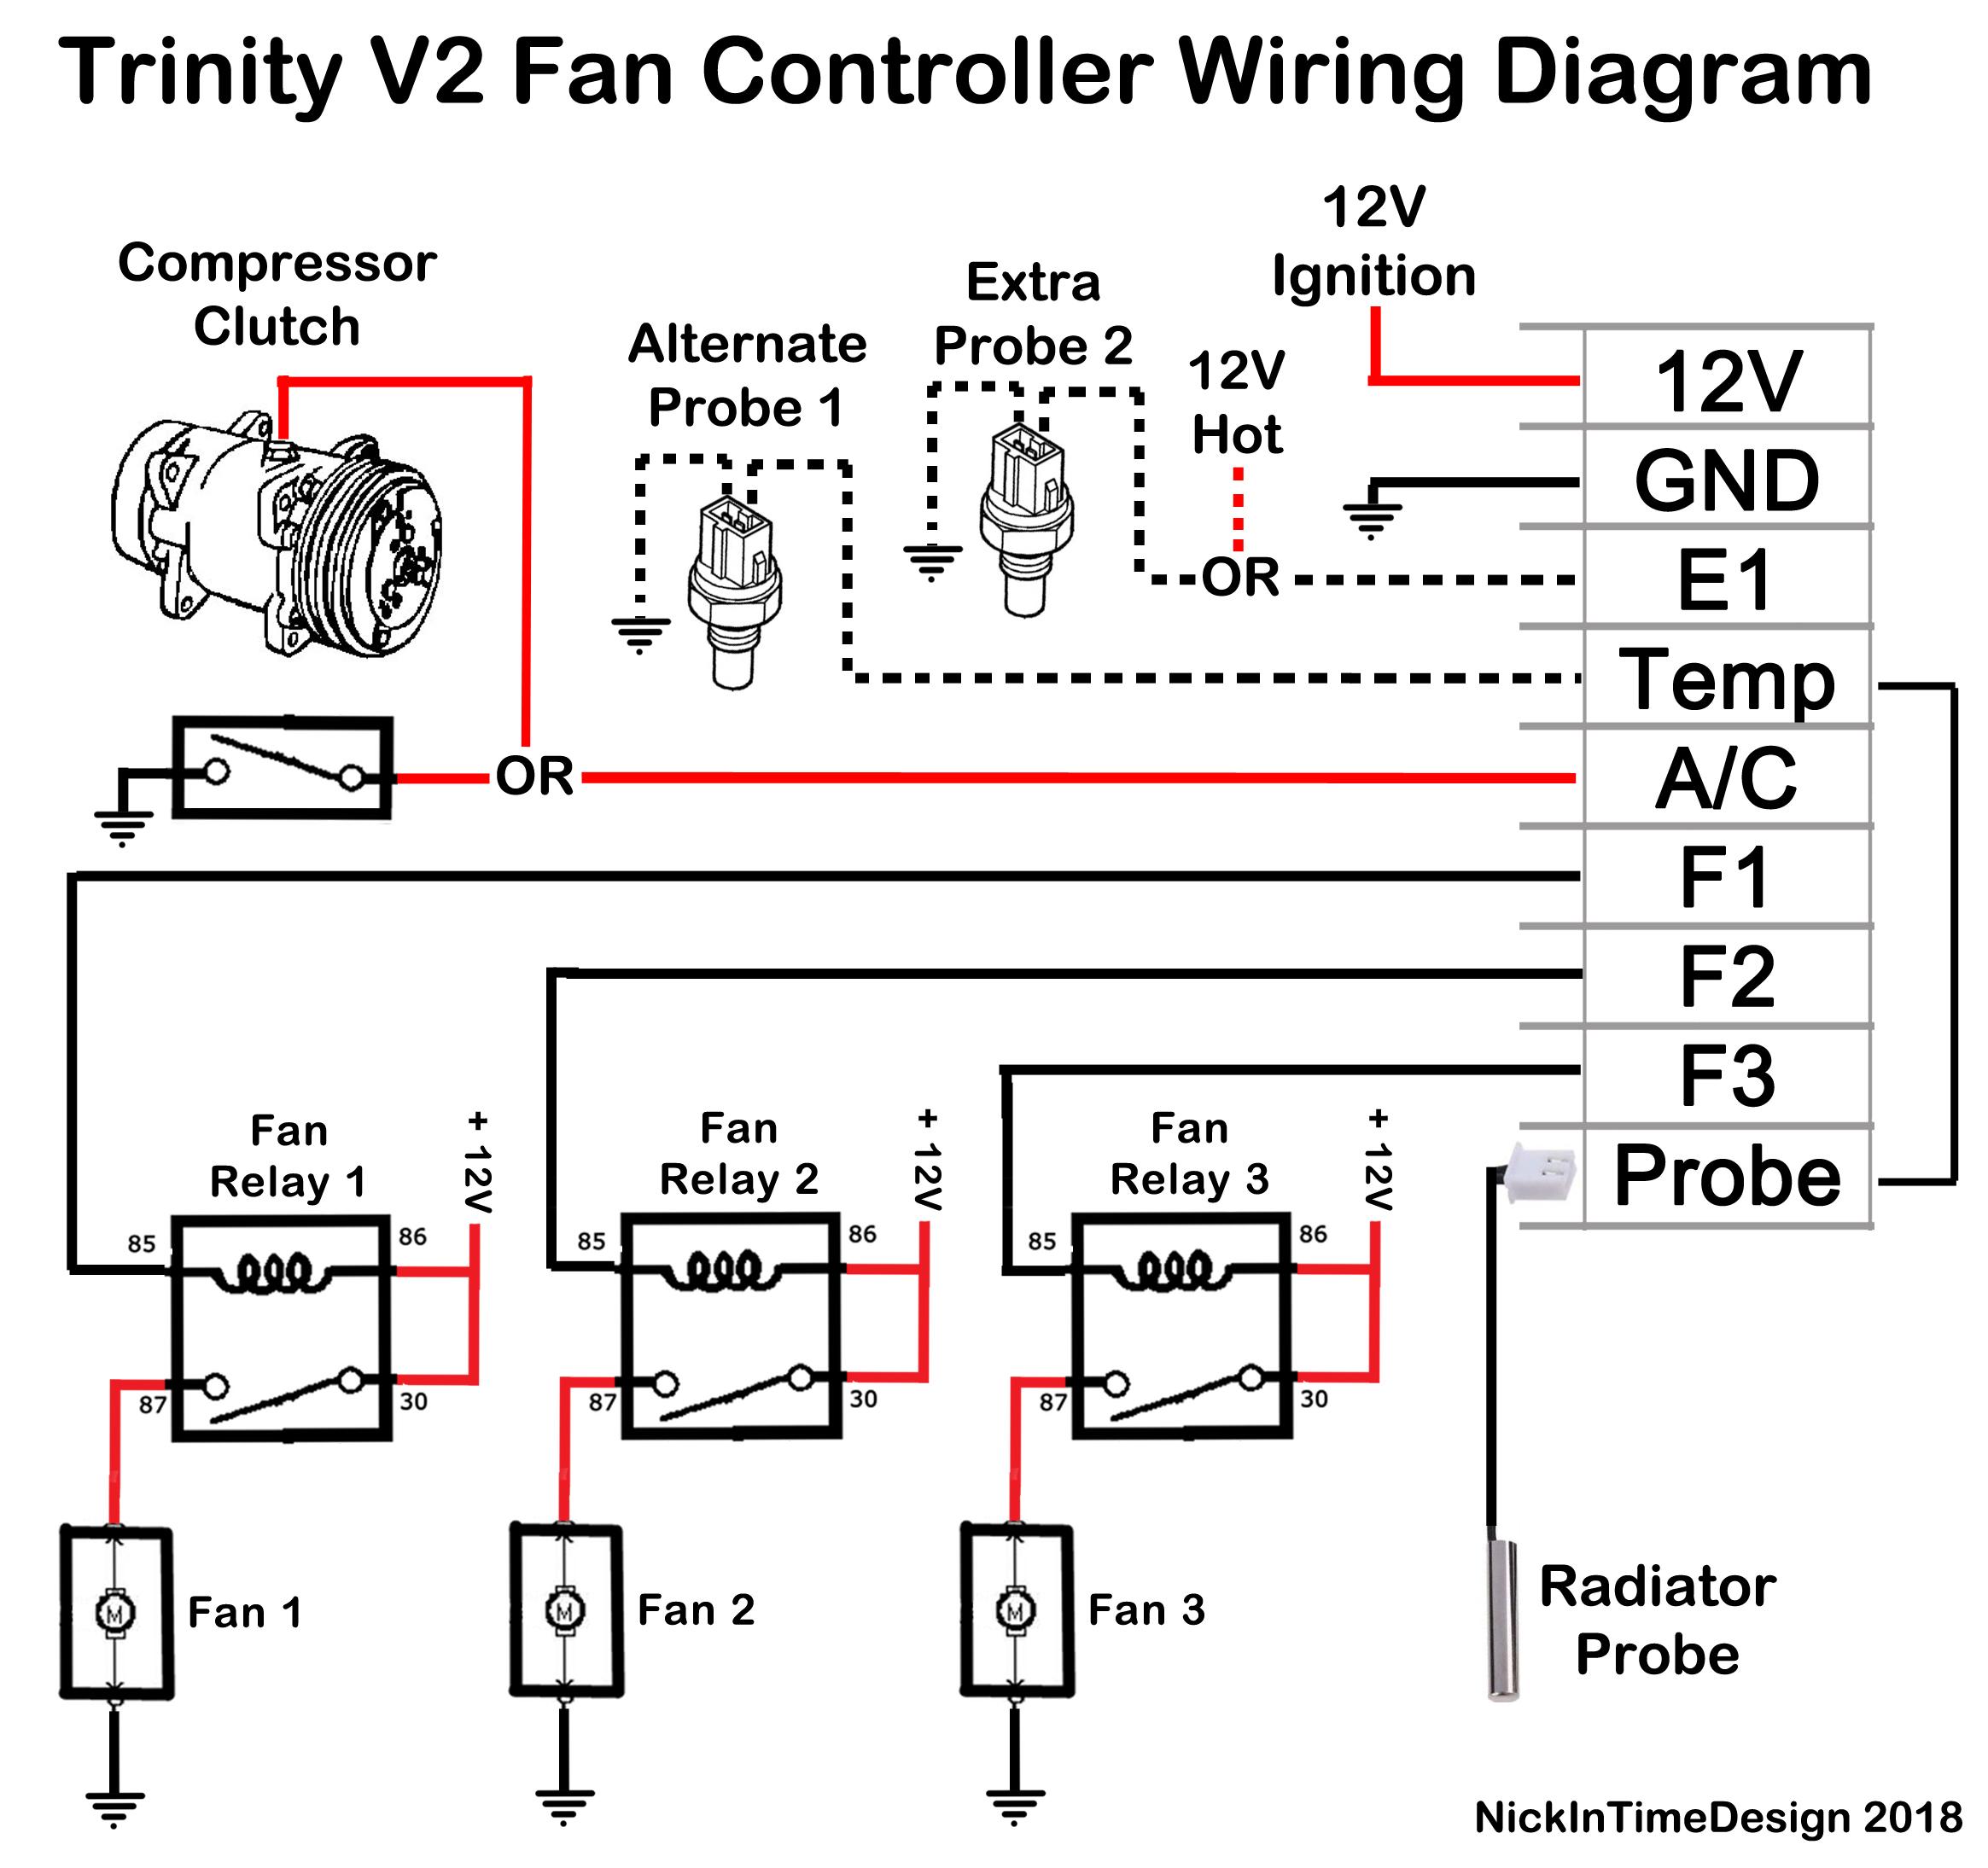 Trinity Fan Controller V2.1 on